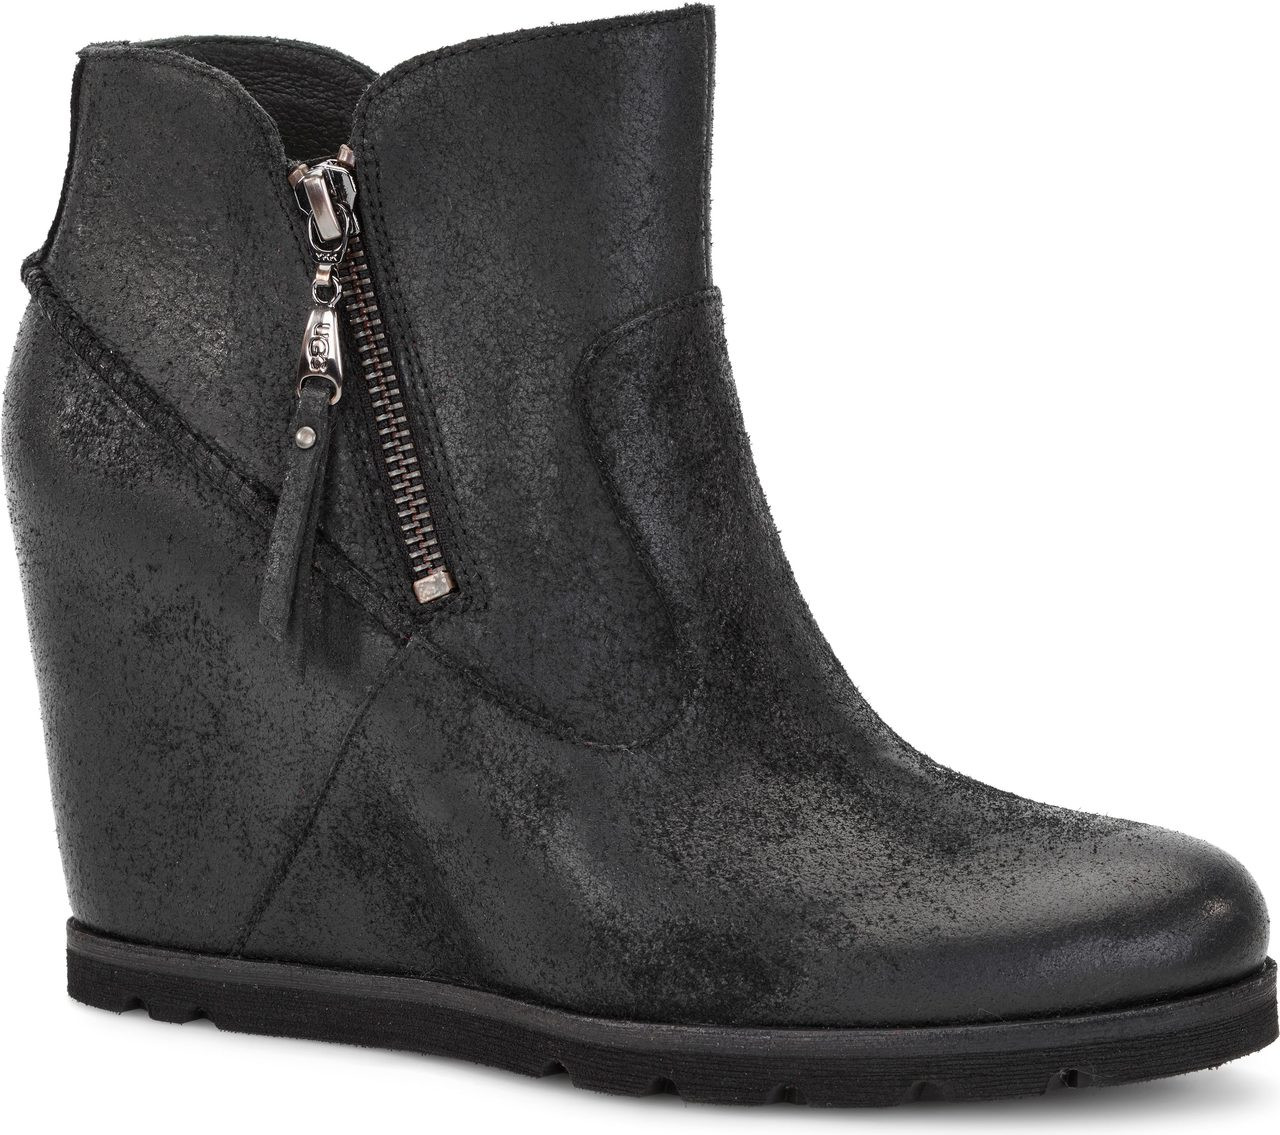 ... Boots; UGG Australia Women's Myrna. Black